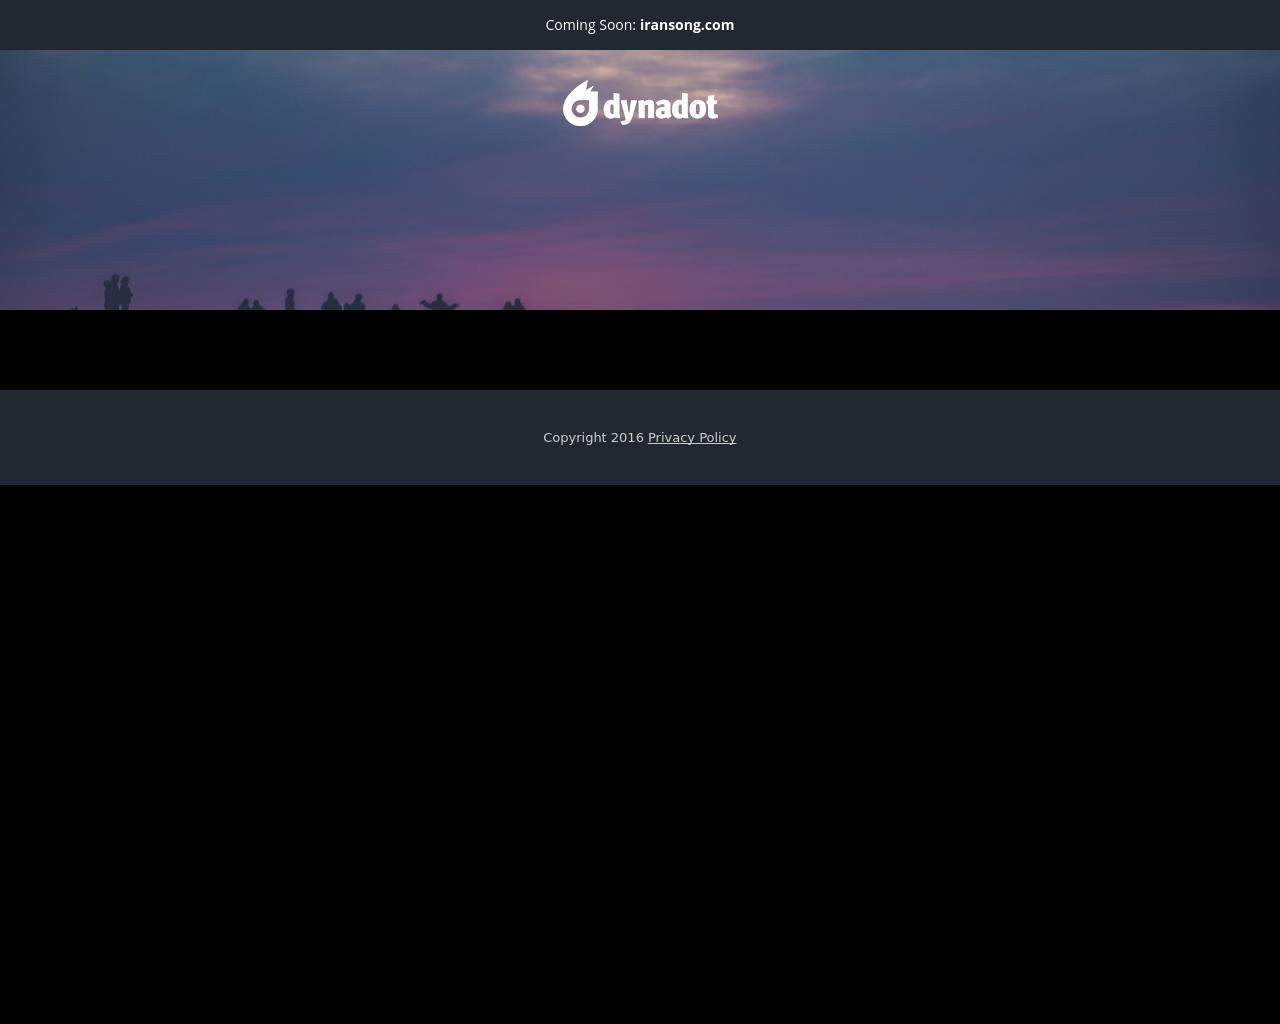 IranSong-Advertising-Reviews-Pricing